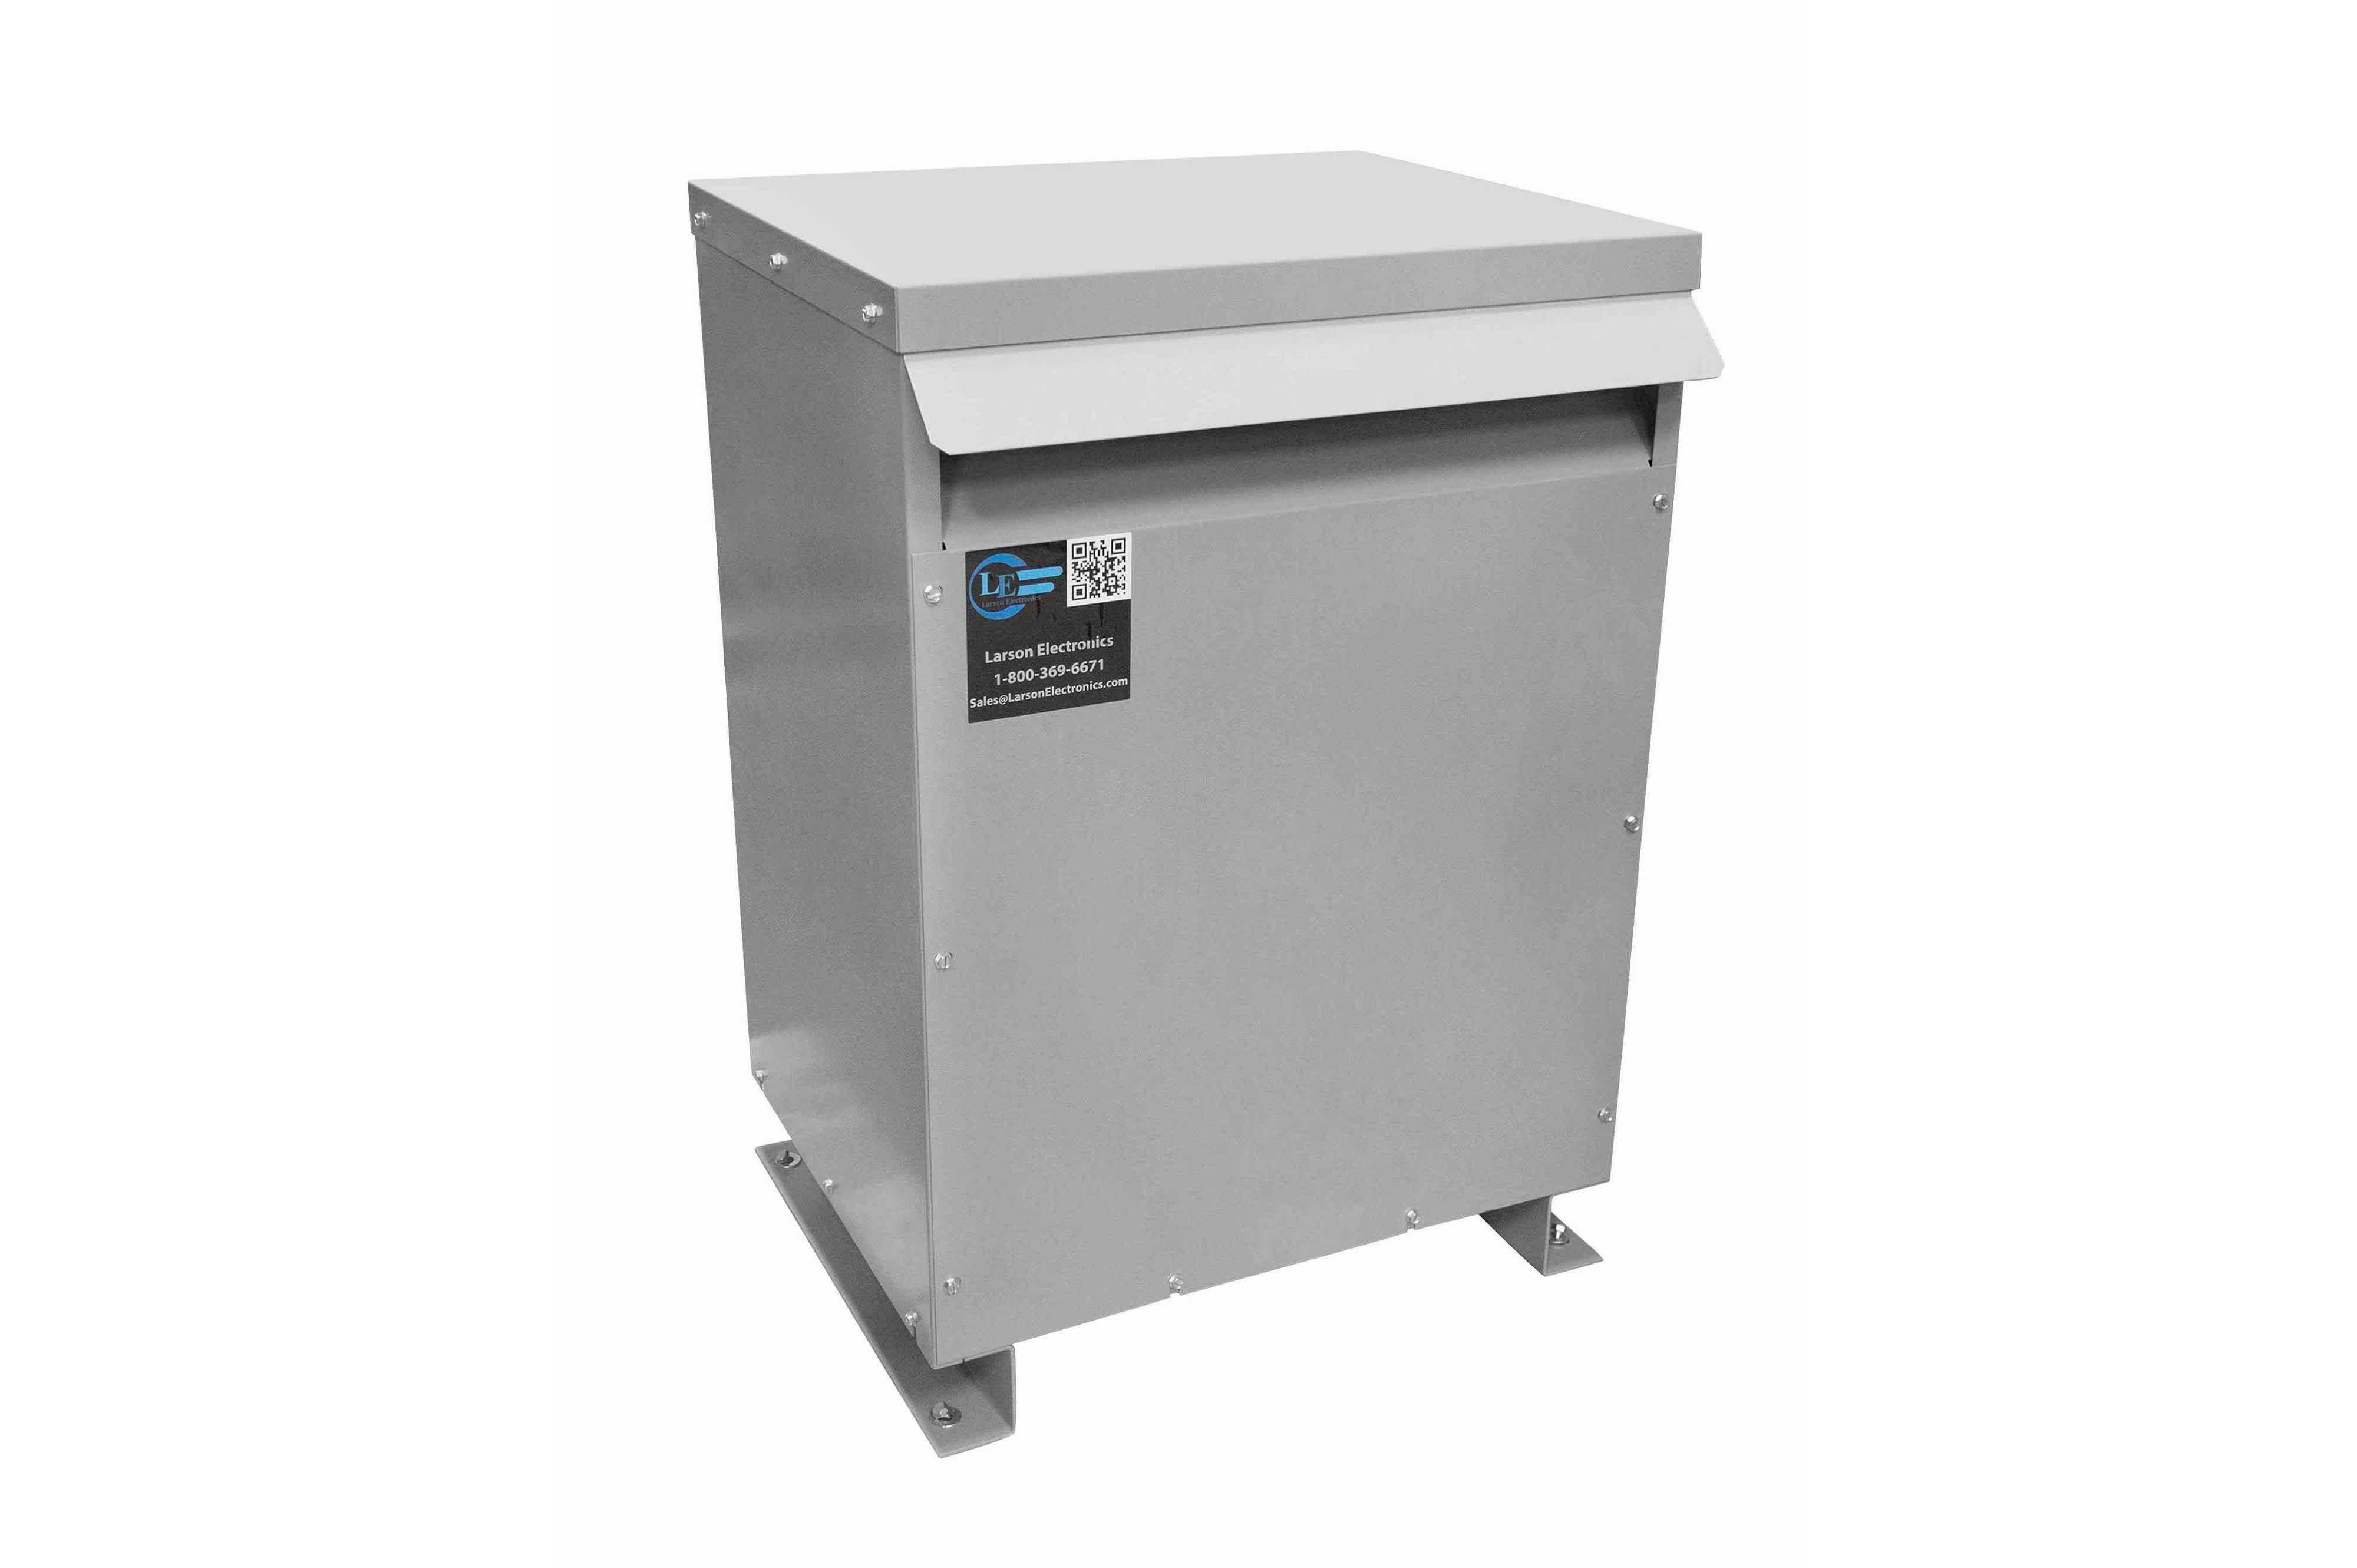 47.5 kVA 3PH Isolation Transformer, 240V Wye Primary, 380Y/220 Wye-N Secondary, N3R, Ventilated, 60 Hz